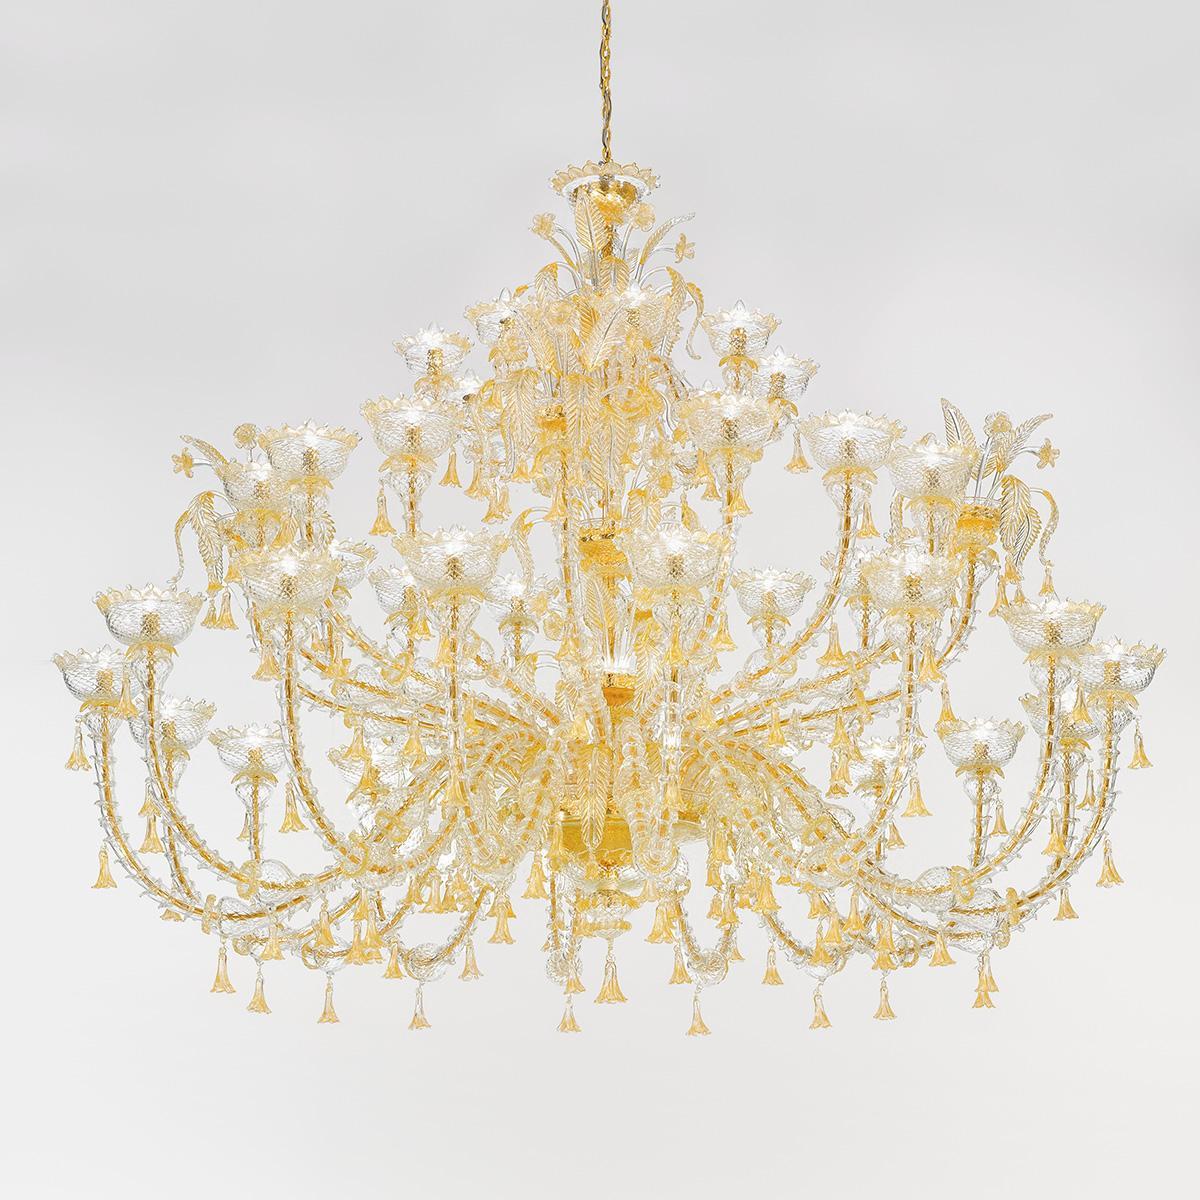 """Silvana"" Murano glas Kronleuchter - 32+8 flammig - gold"